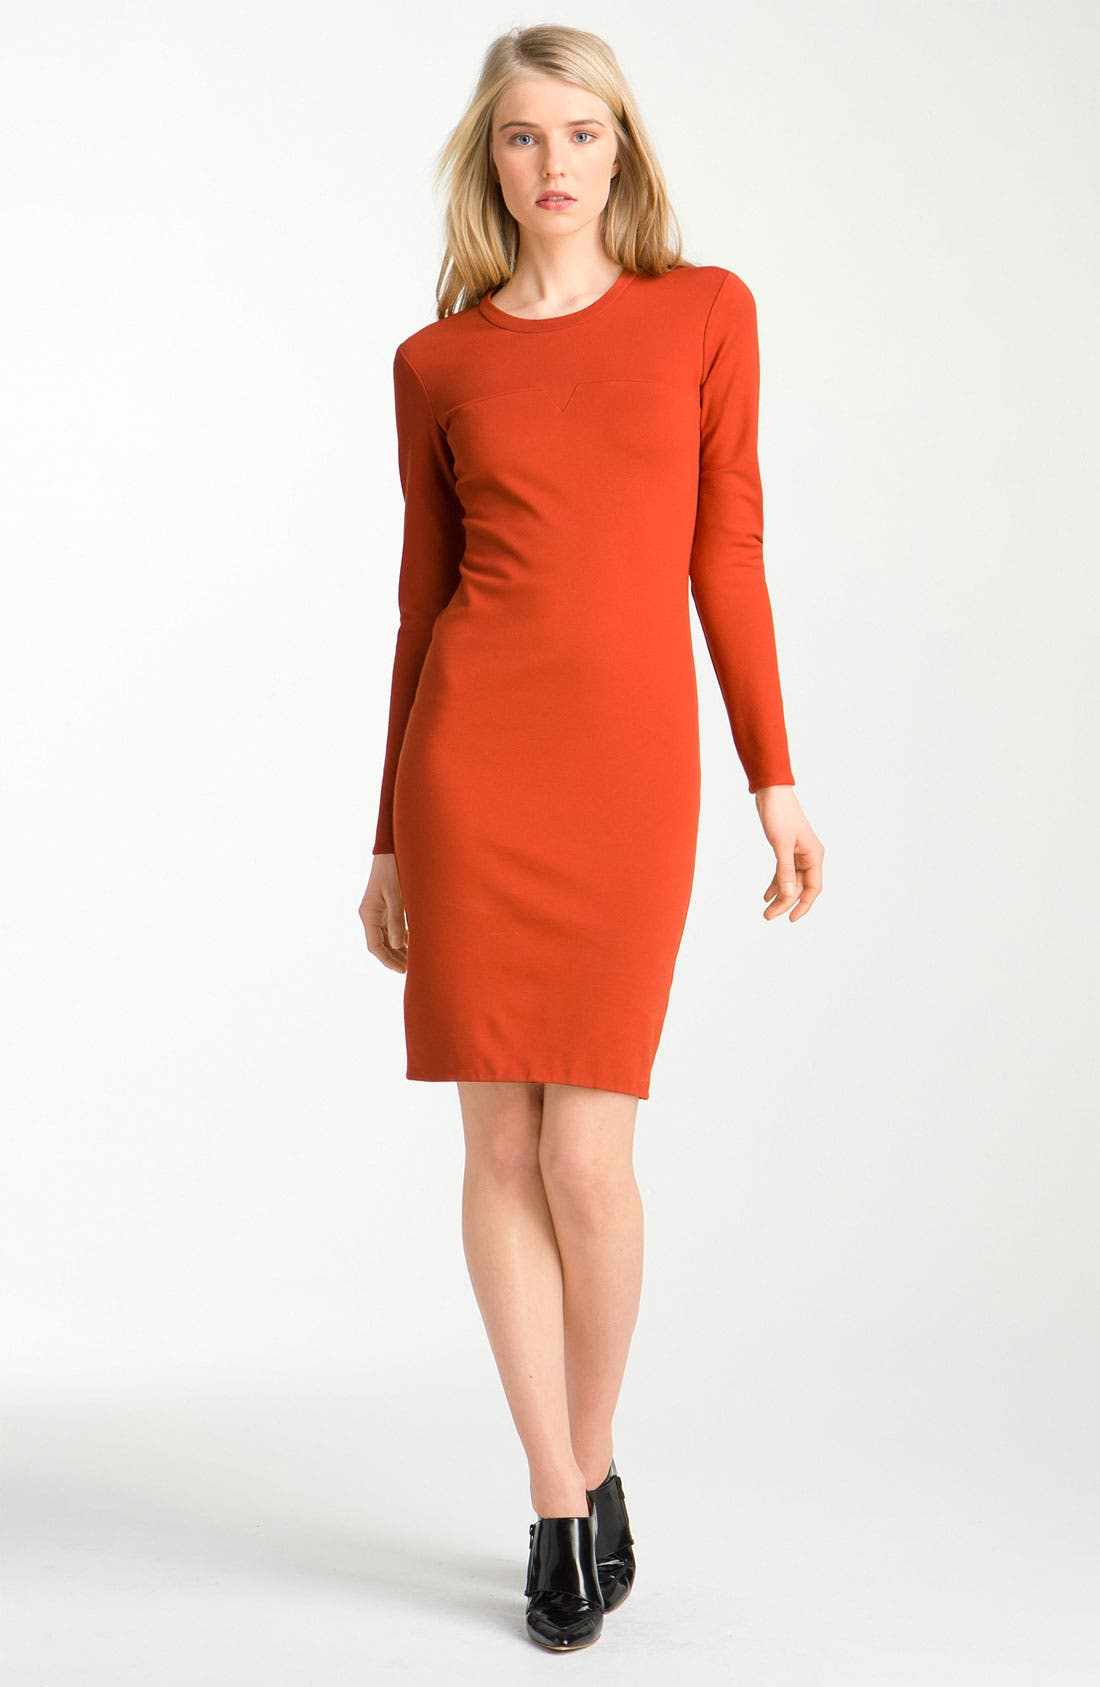 Alternate Image 1 Selected - 3.1 Phillip Lim Jersey Dress